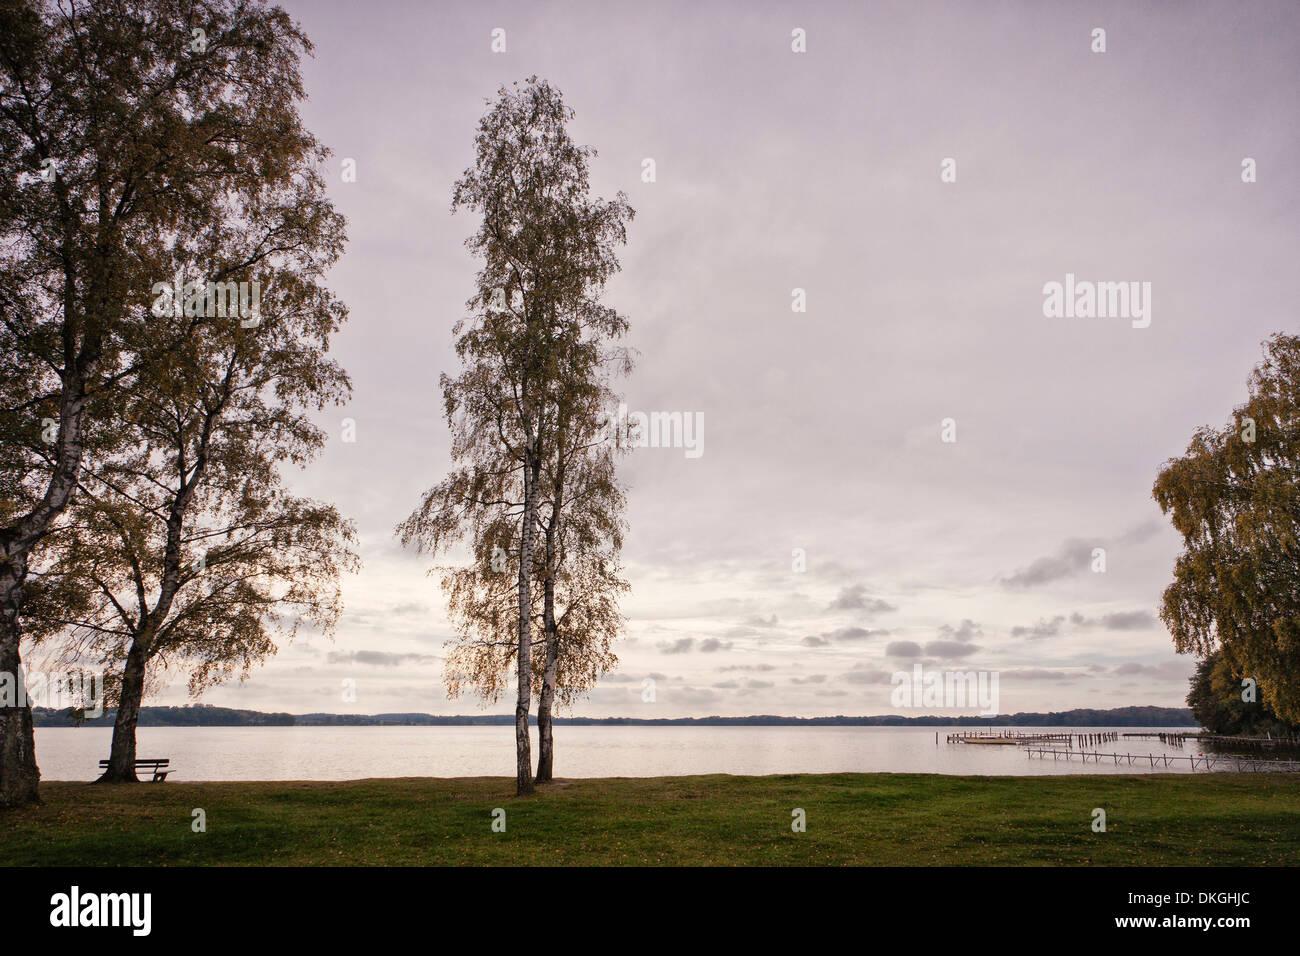 Lake Ploen, Holsteinische Schweiz, Schleswig-Holstein, Germany, Europe - Stock Image